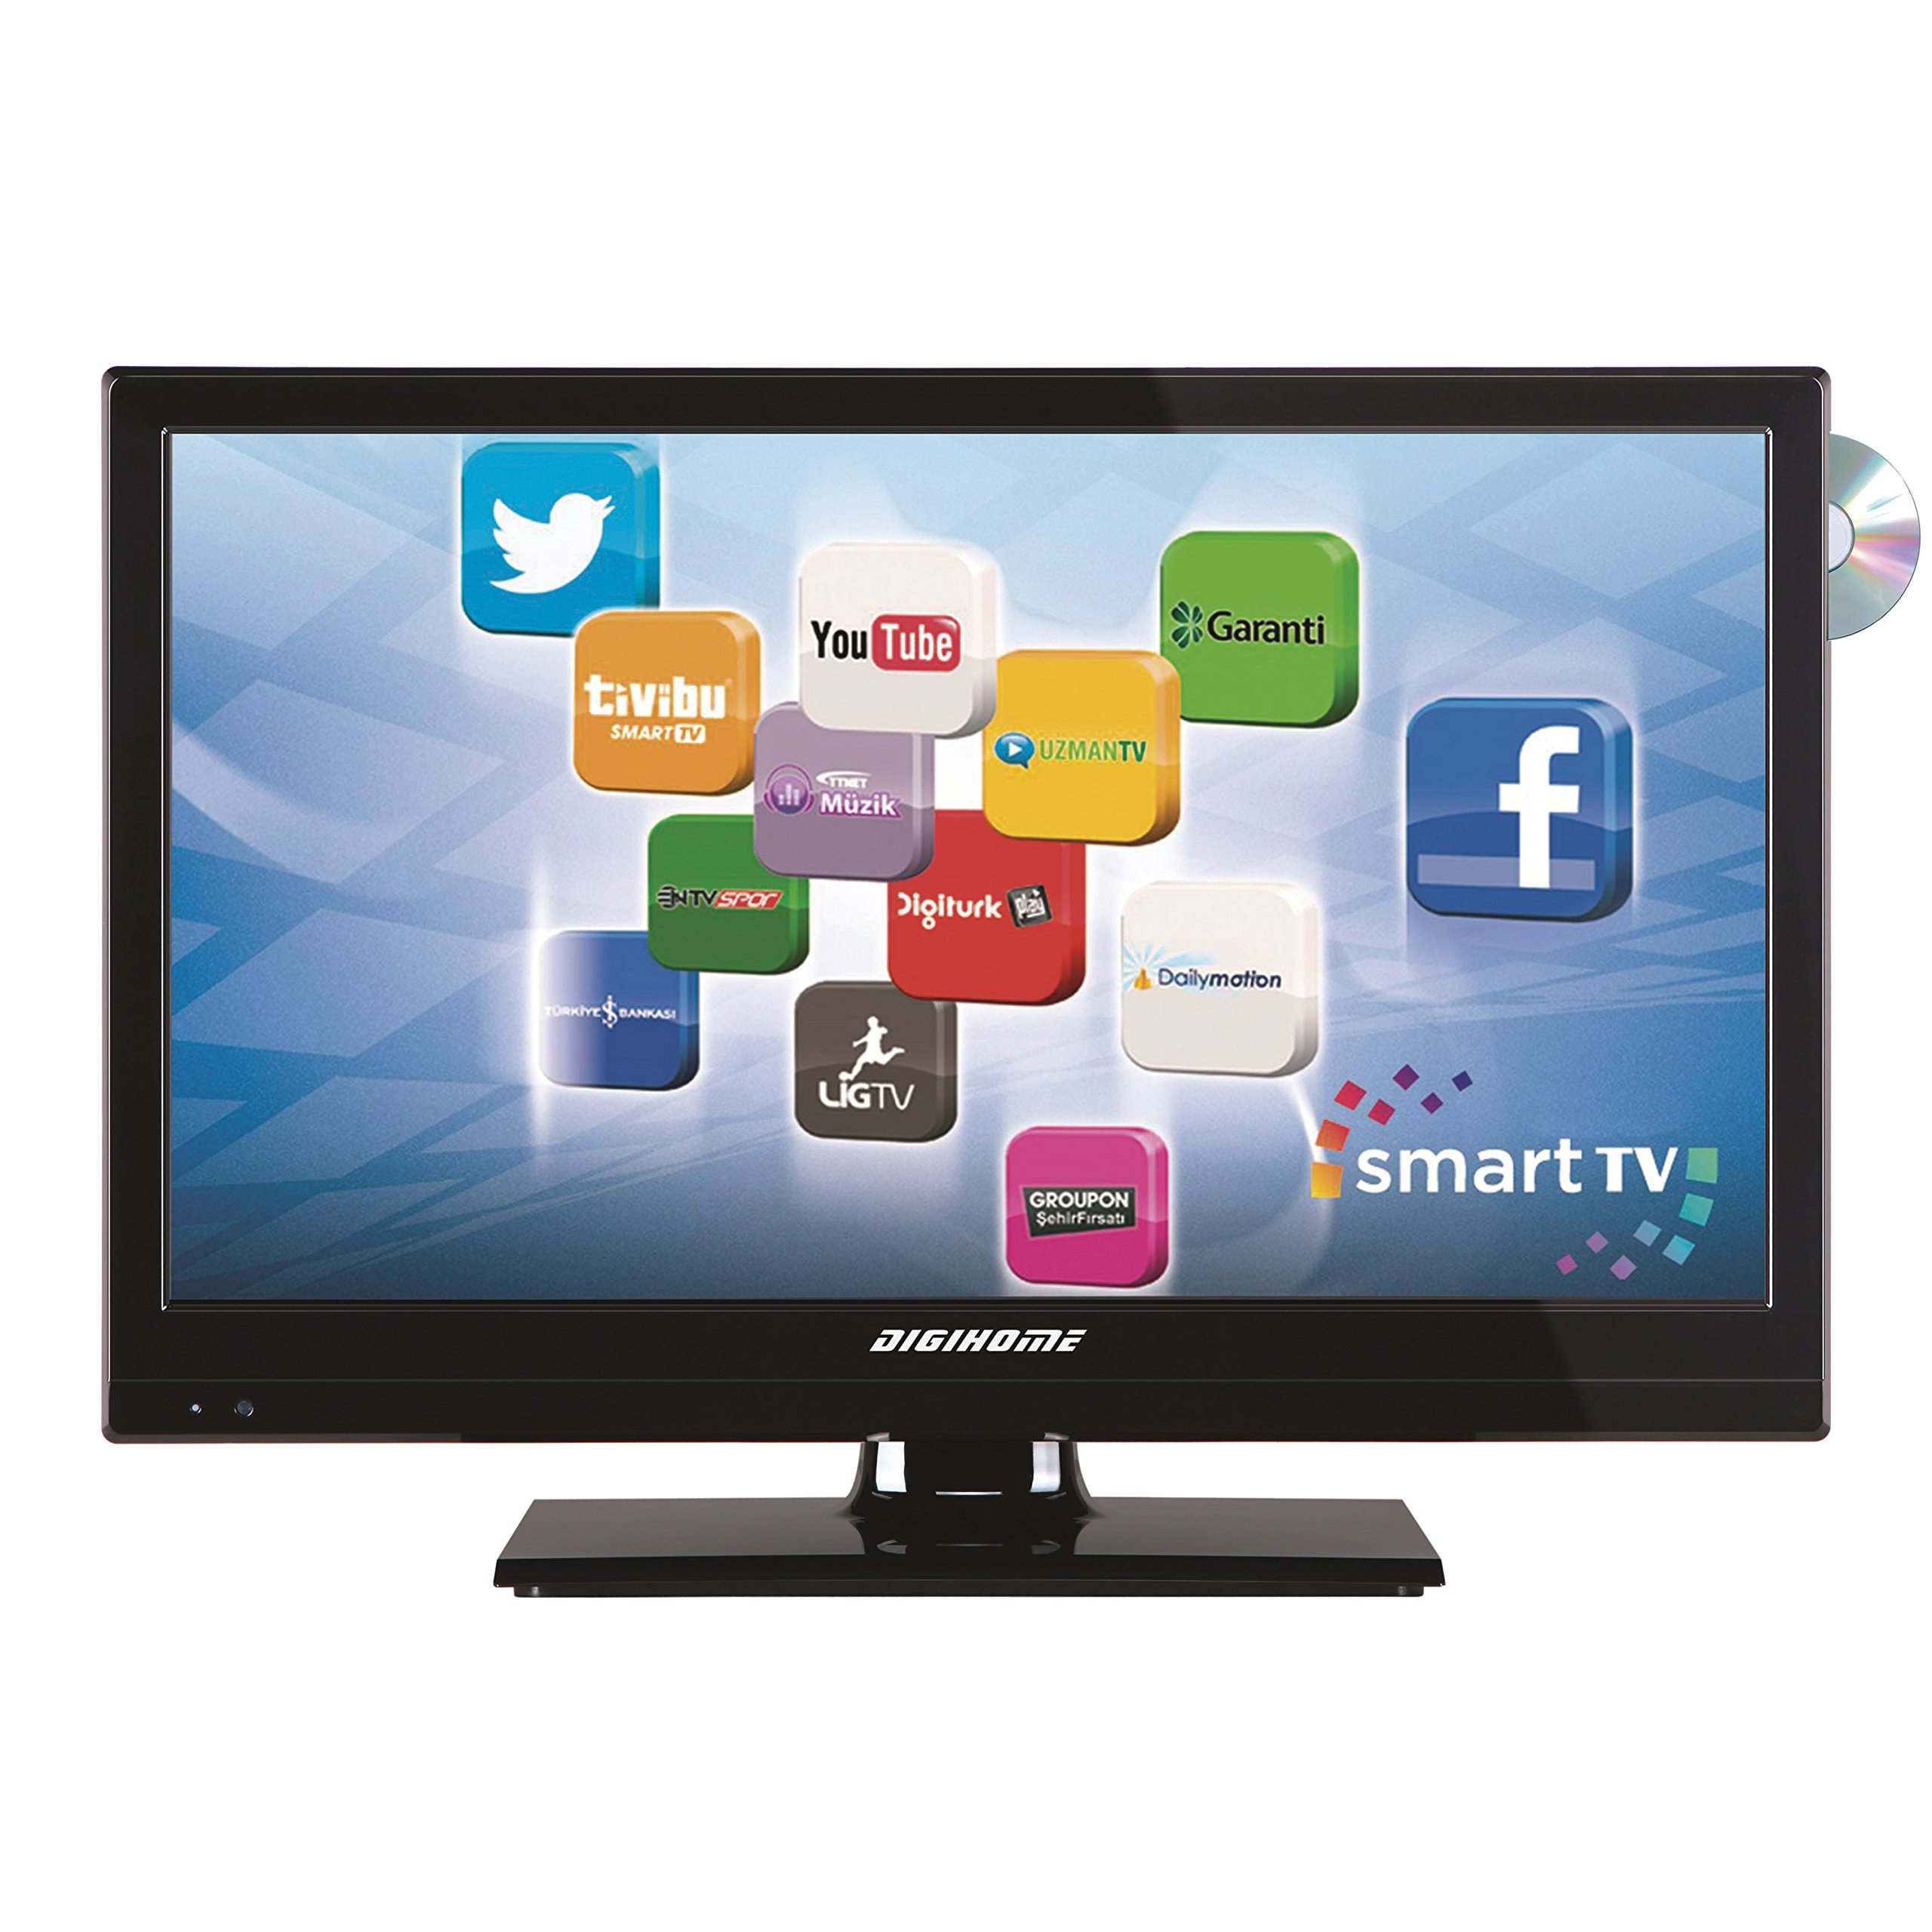 Smart TV Wifi DVB-T2 DVD 19,6